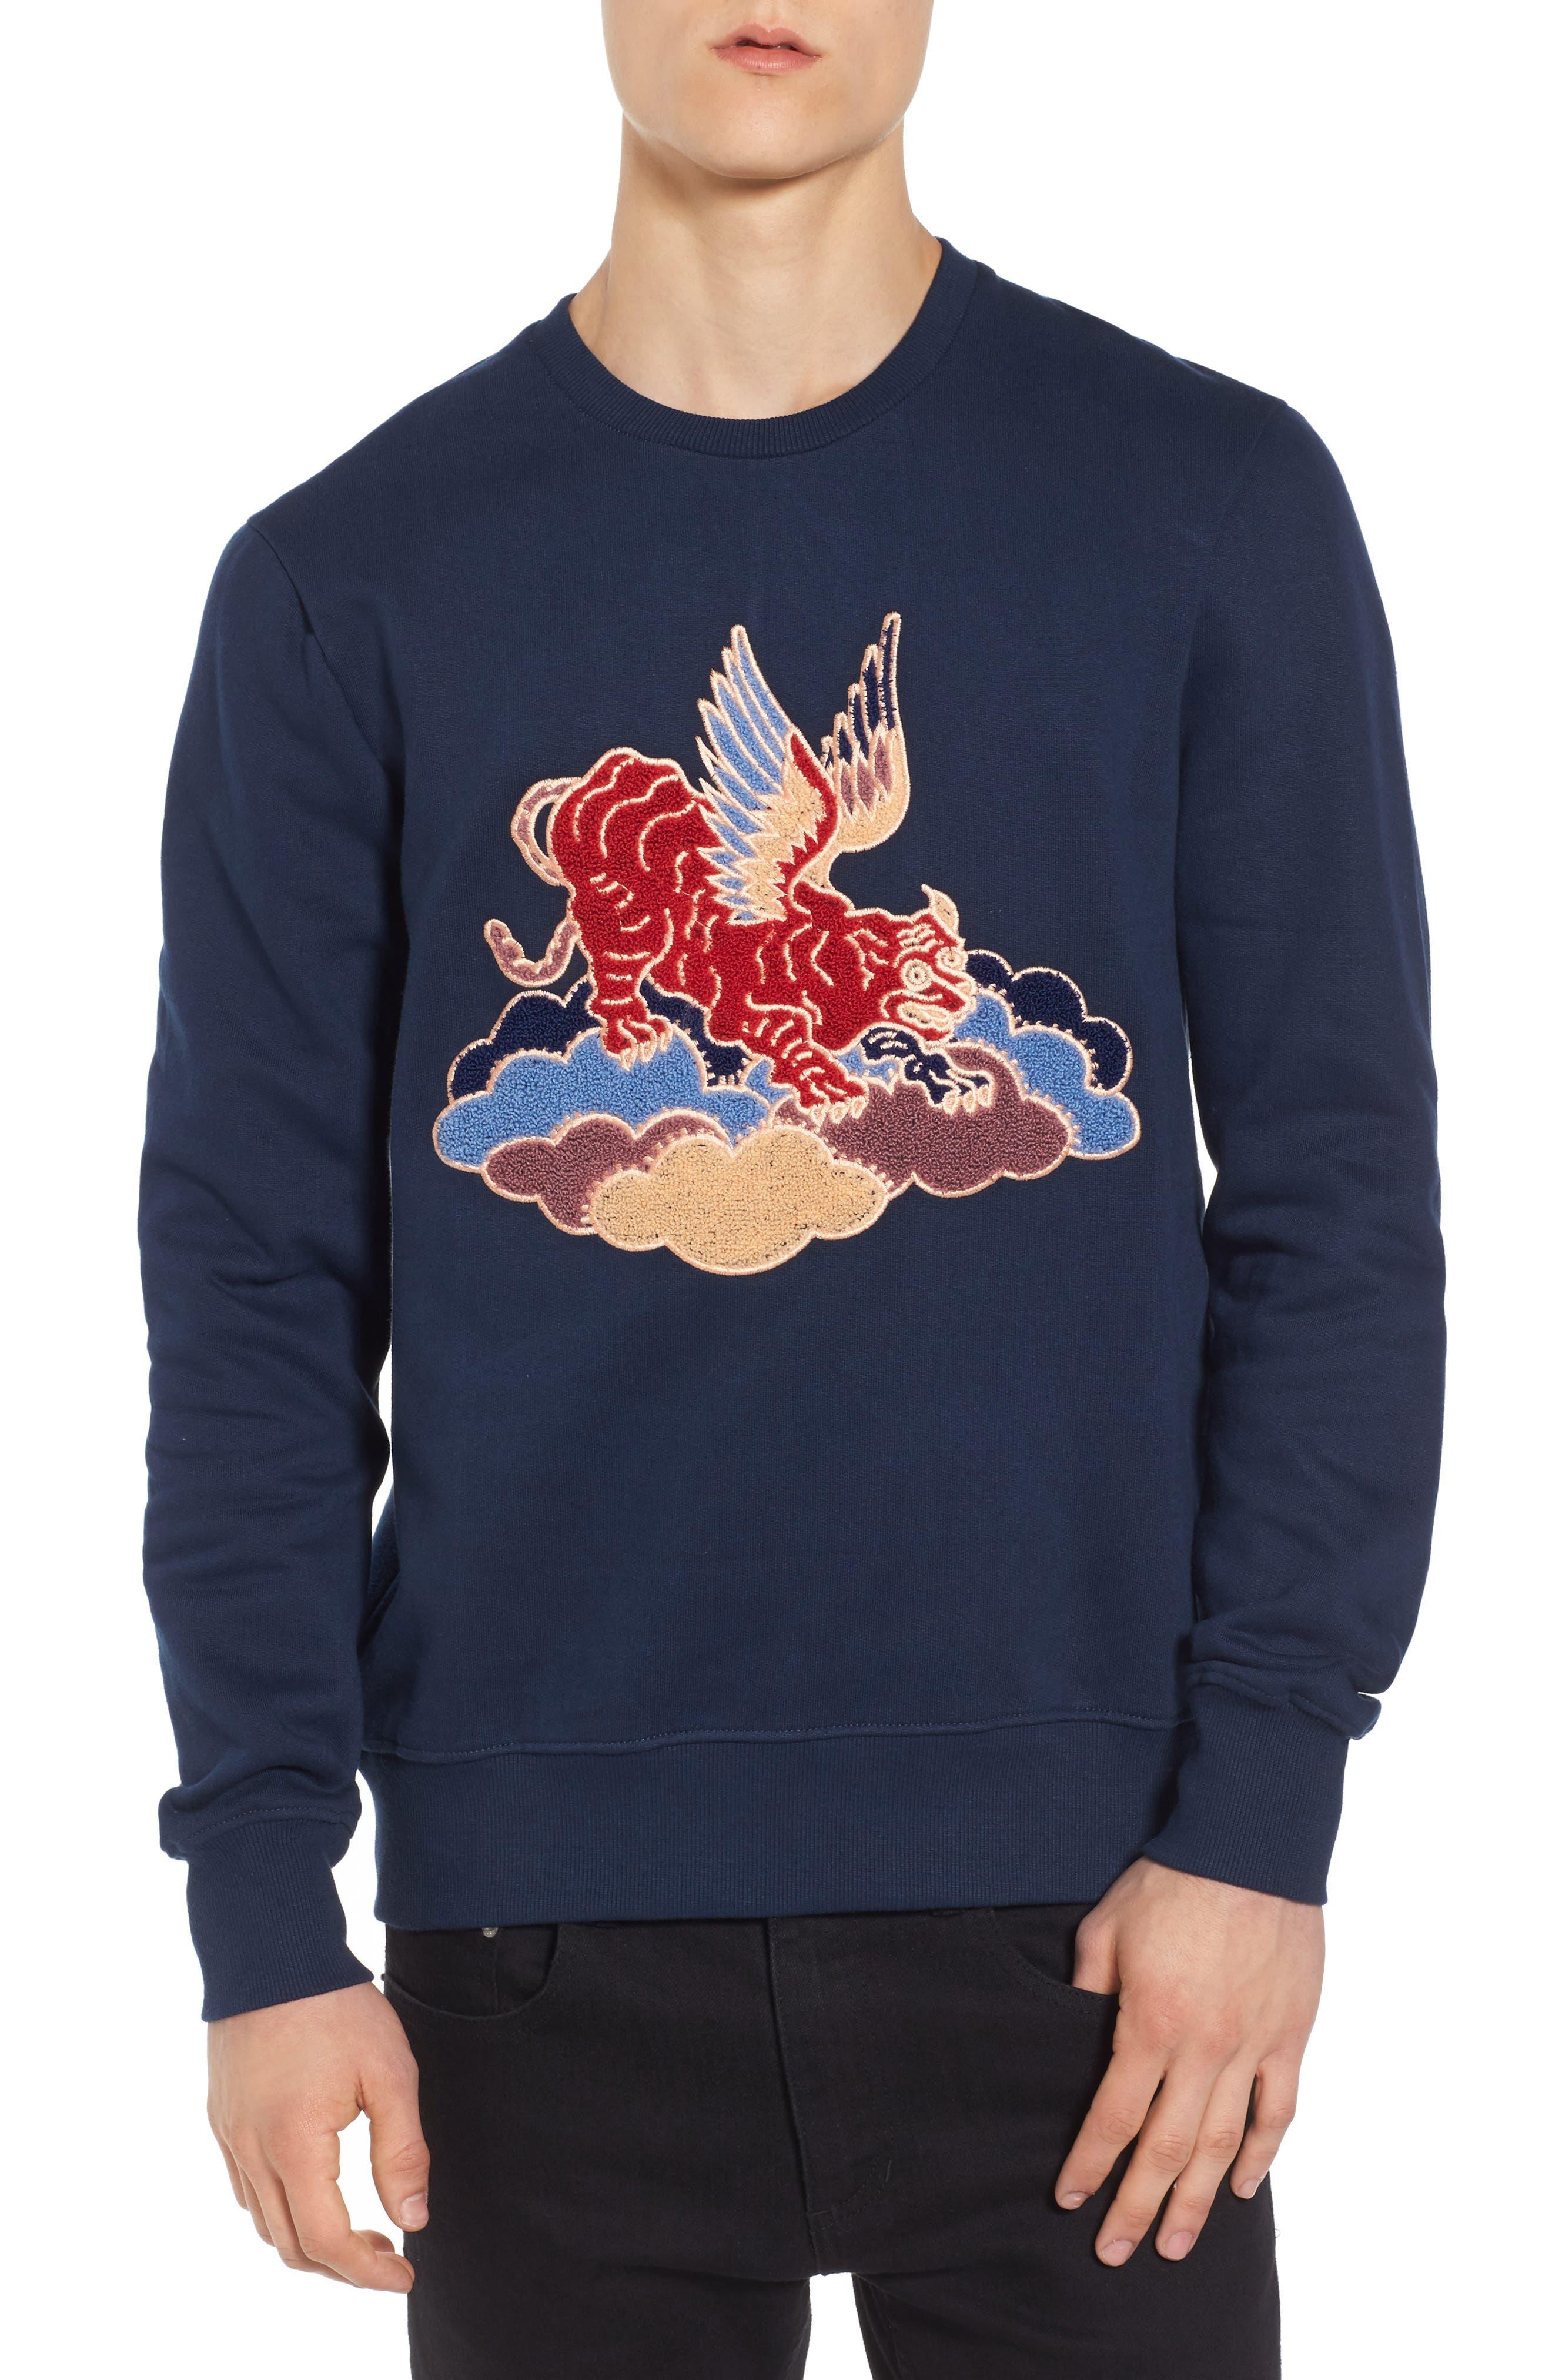 Alternate Image 1 Selected - ELEVENPARIS Nokat Appliqué Sweatshirt